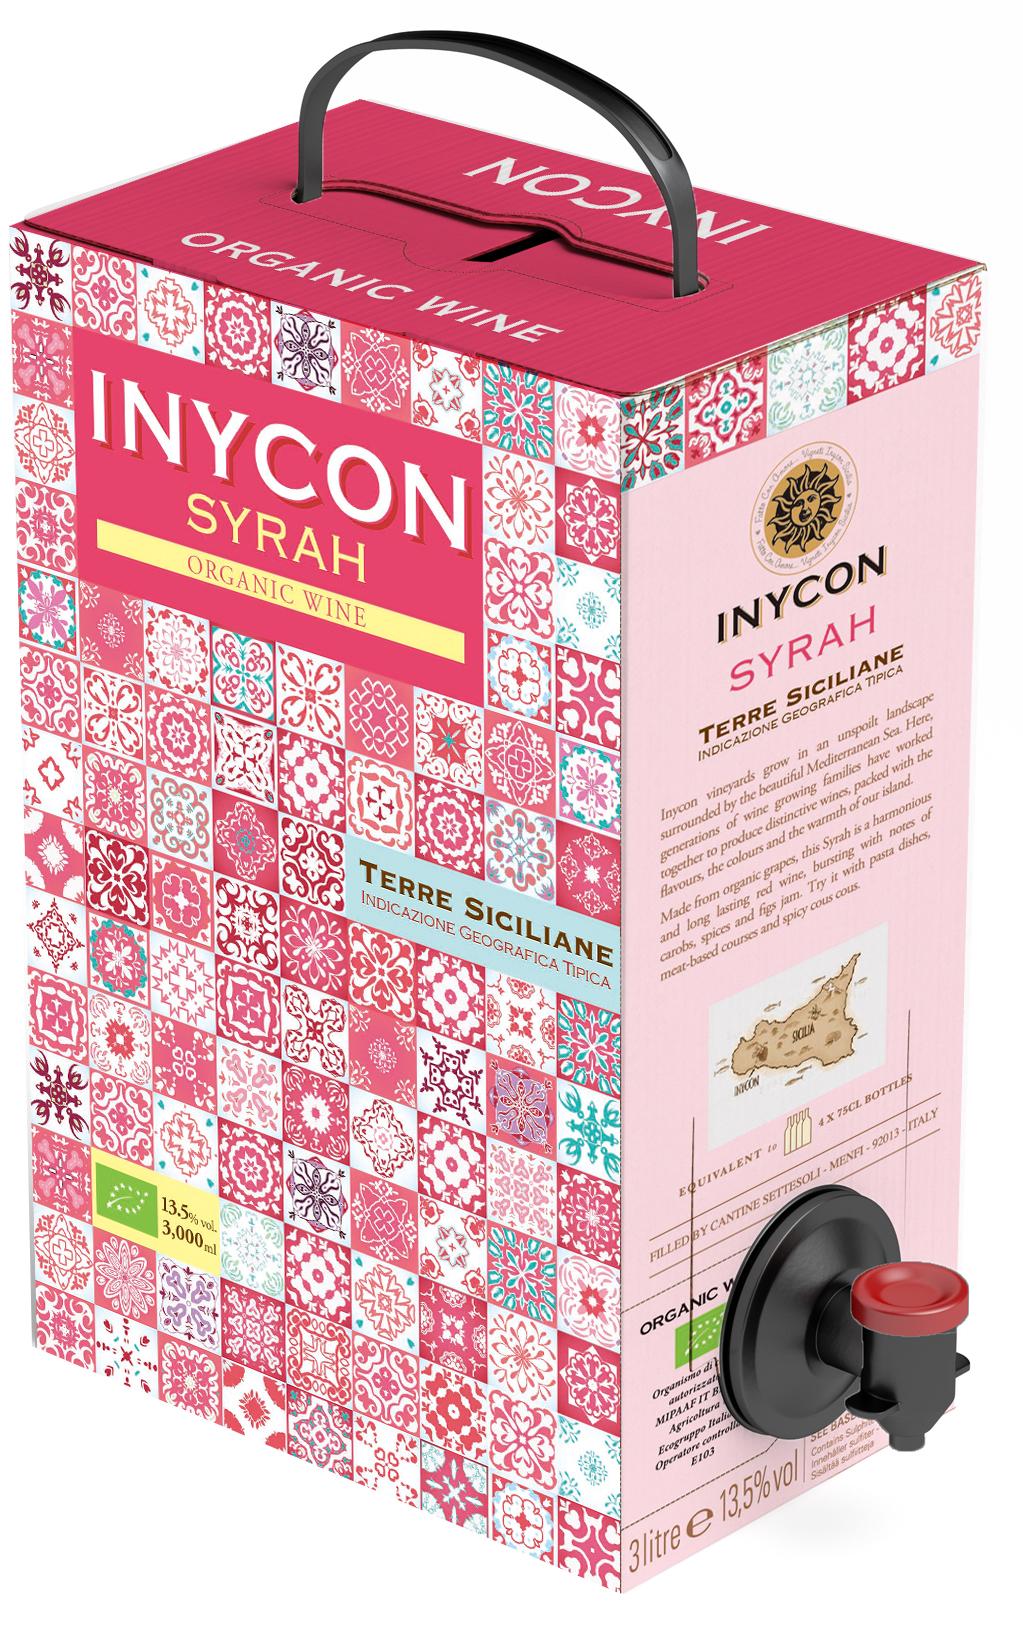 Kameya Inycon Organic Syrah 3L カメヤ イニコン オーガニックシラー3L